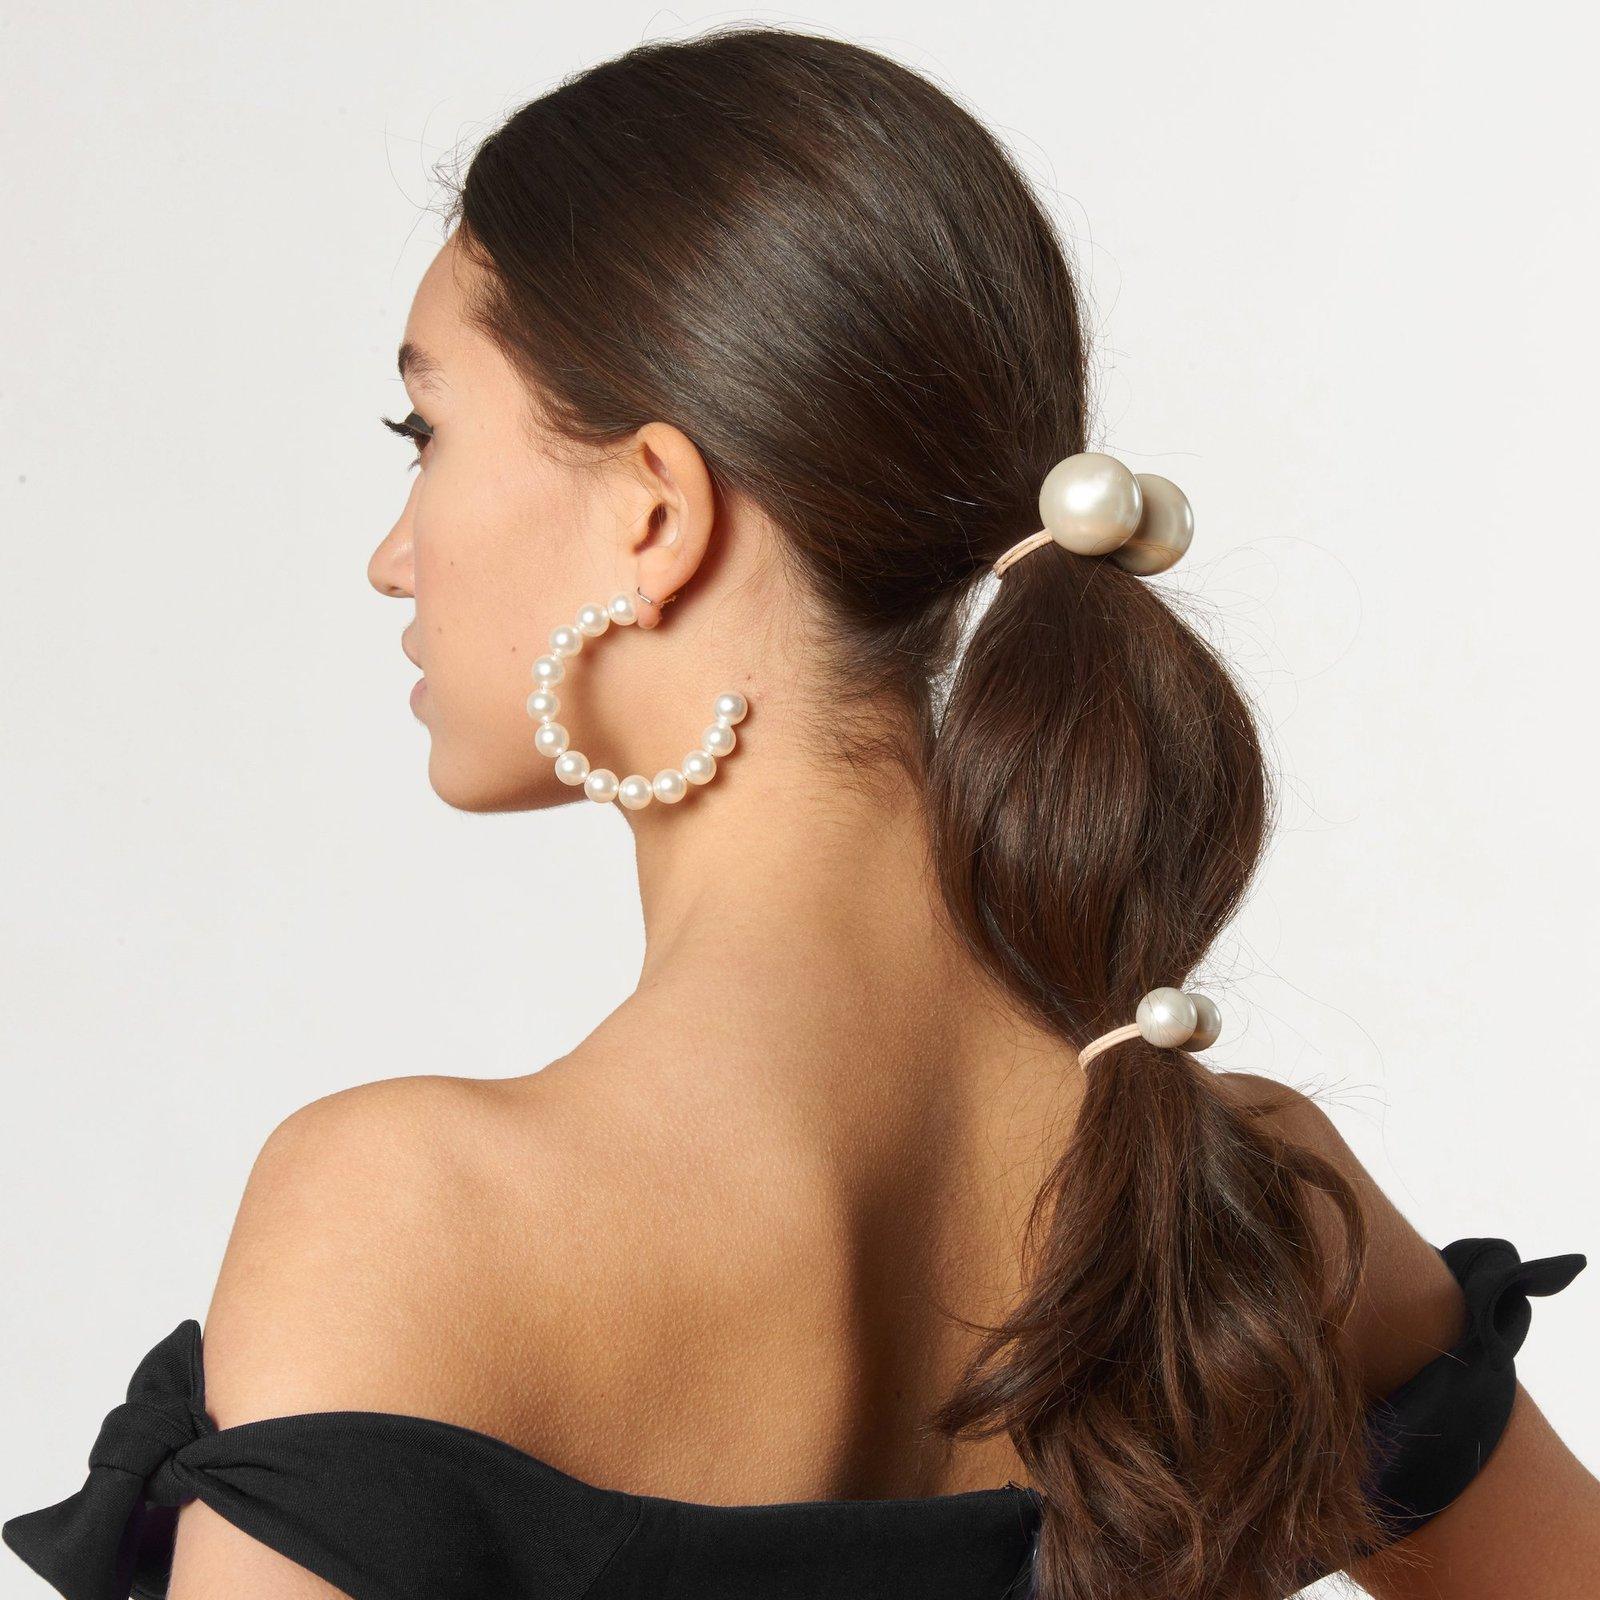 LELE SADOUGHI  Gumball Hair Tie  £19.00